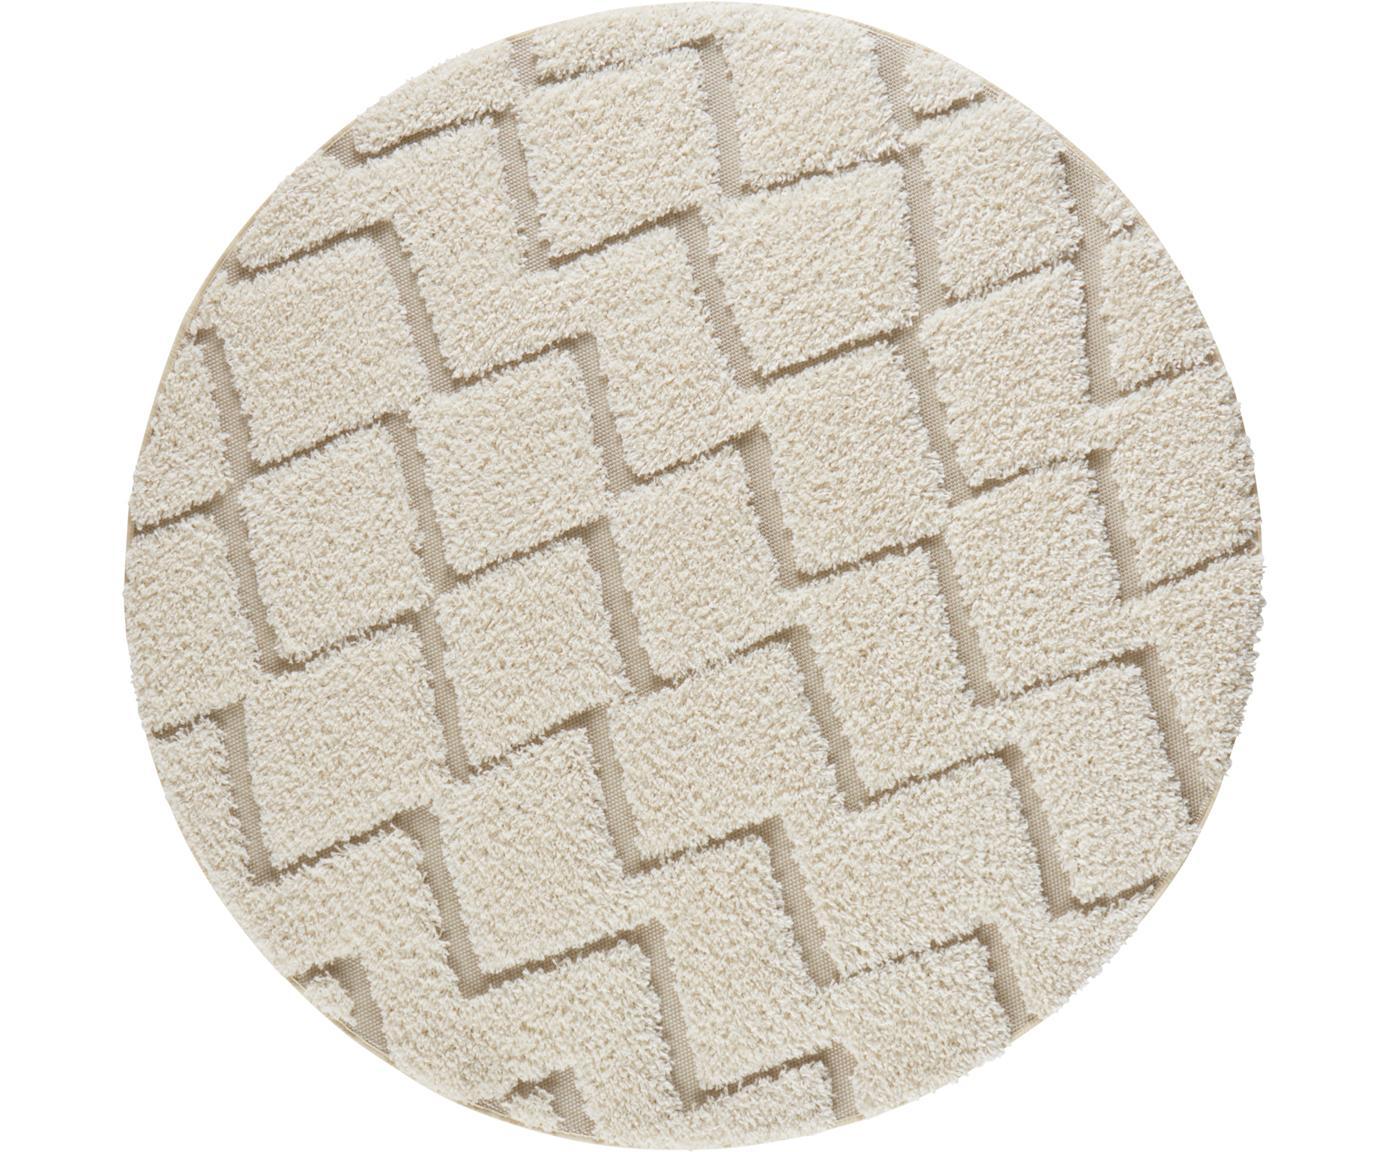 Alfombra redonda texturizada de interior/exterior Dades, Crema, beige, Ø 160 cm (Tamaño L)